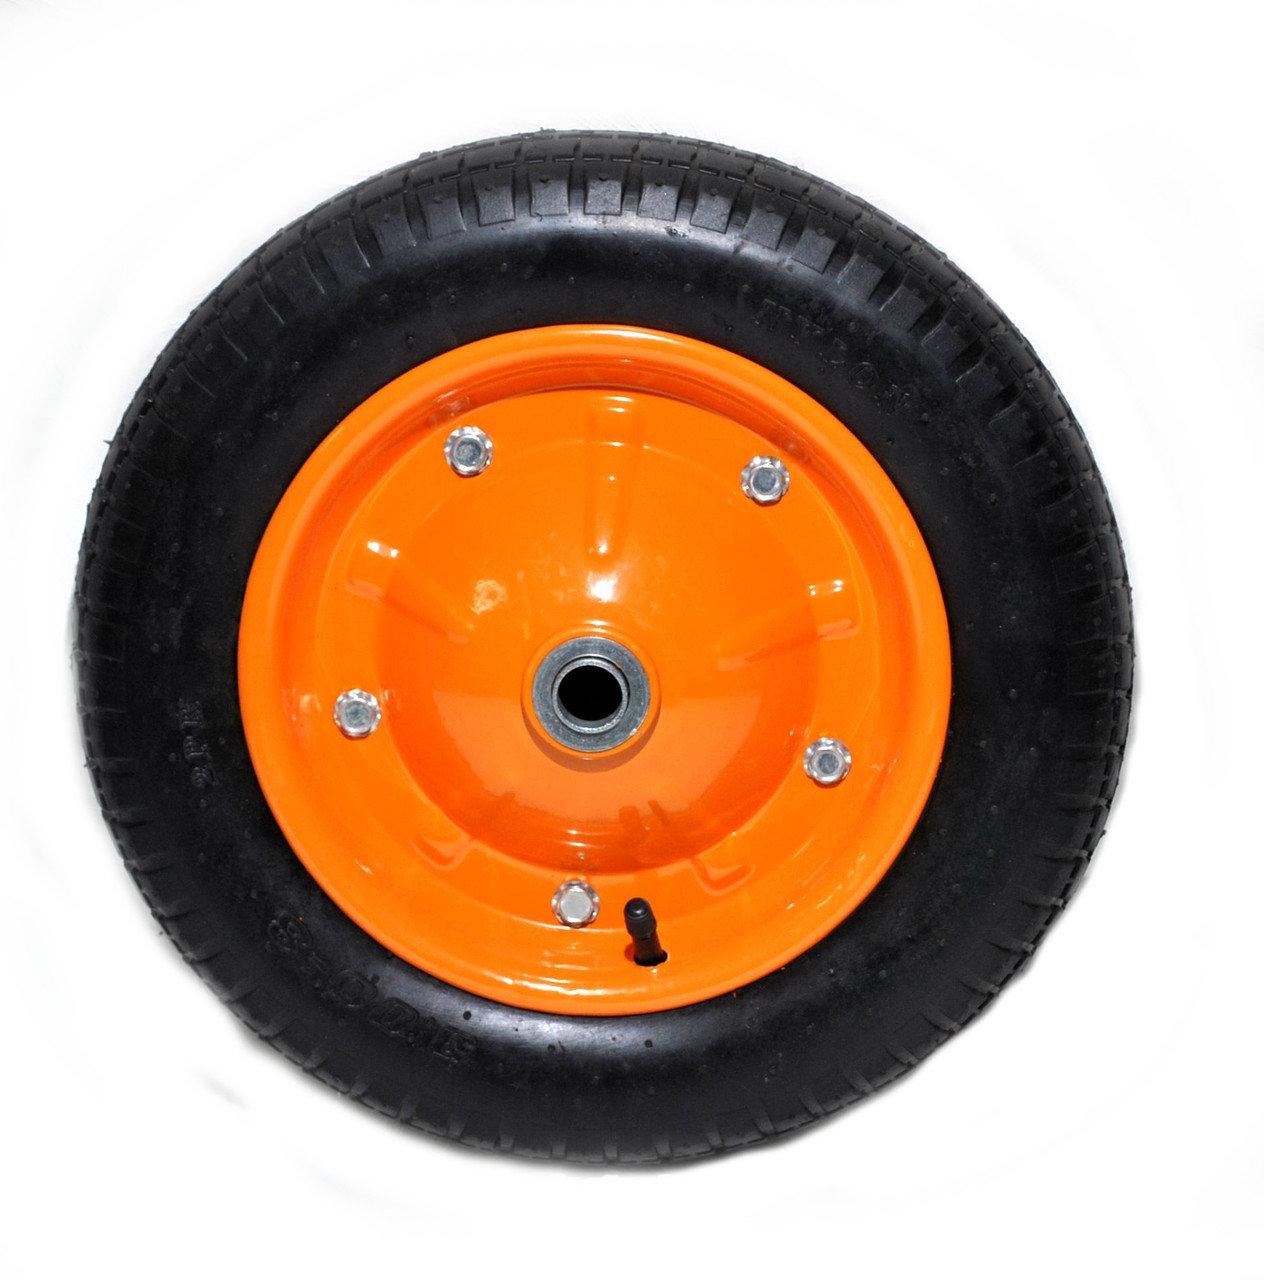 Техника для склада Колесо рулевое для гидравл. тележки резина 180*50*50, шт